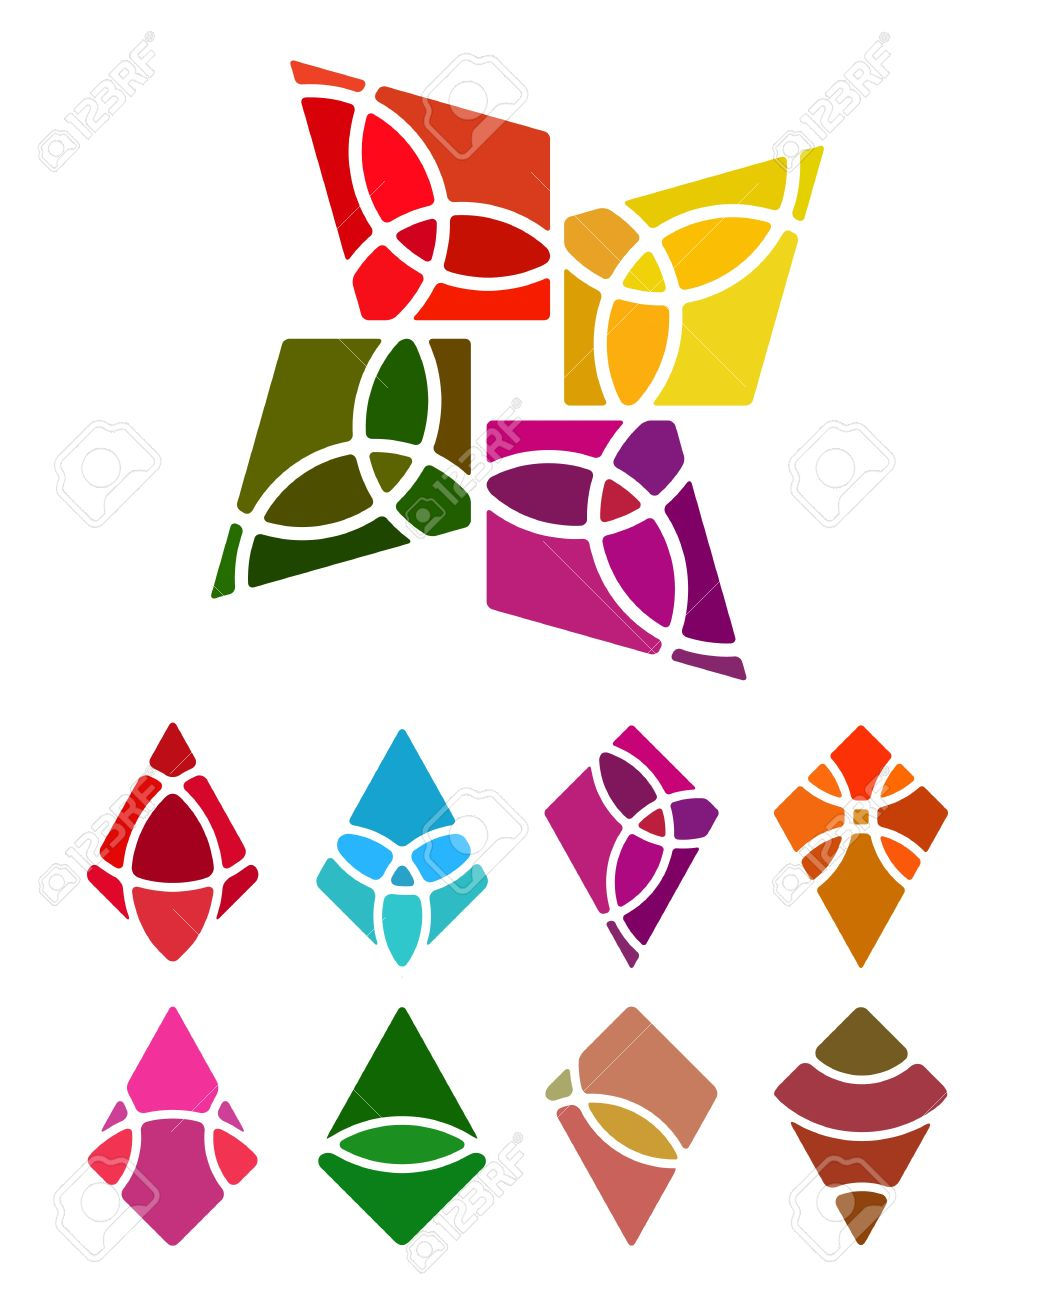 design logo abstract diamond shaped element crushing vector rh 123rf com diamond shaped logo design diamond shape logo on sunglasses